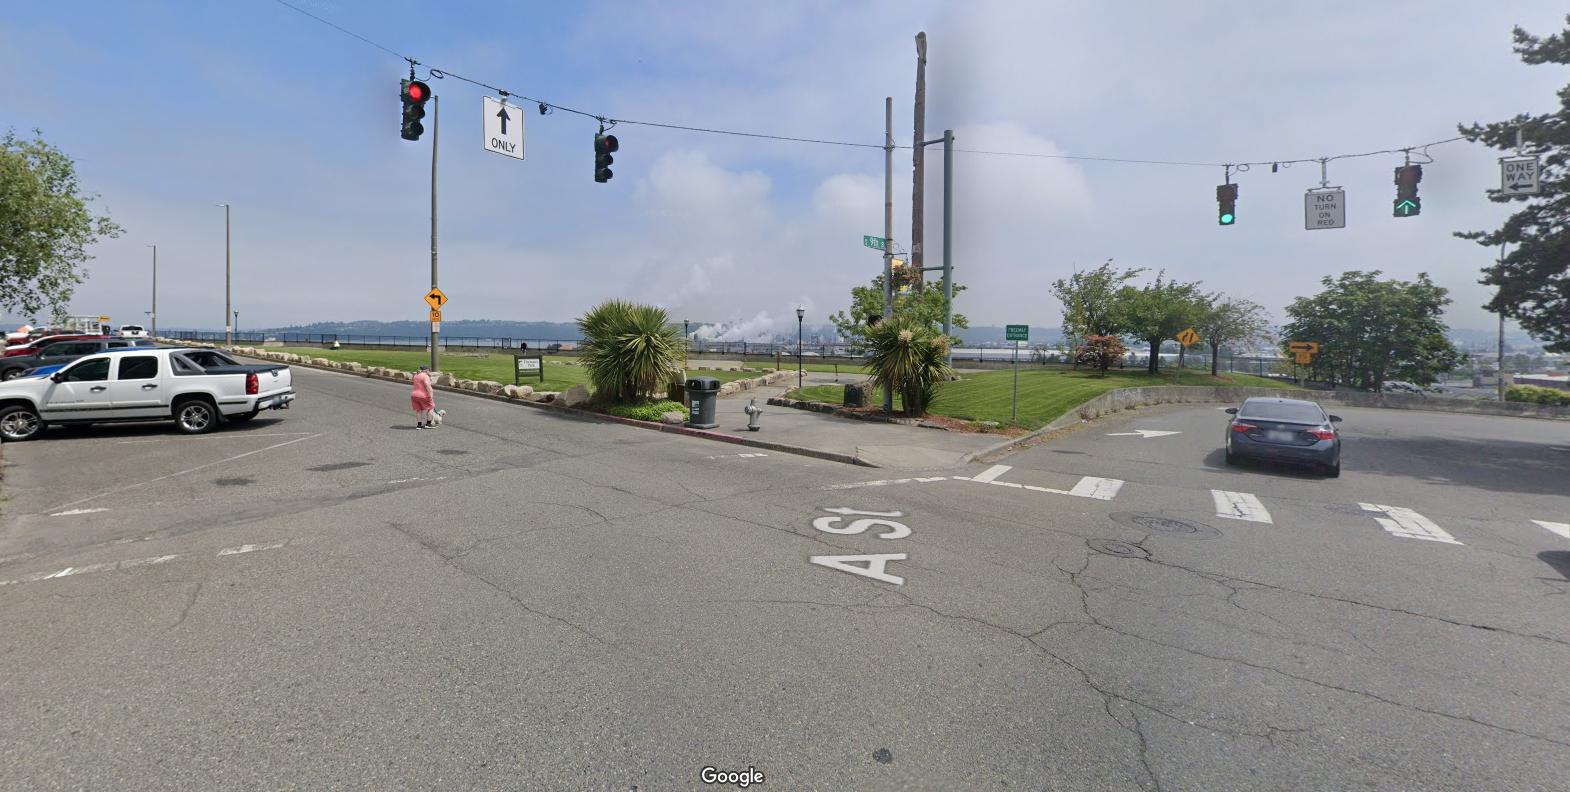 Fireman's Park_Google Streetview_2019